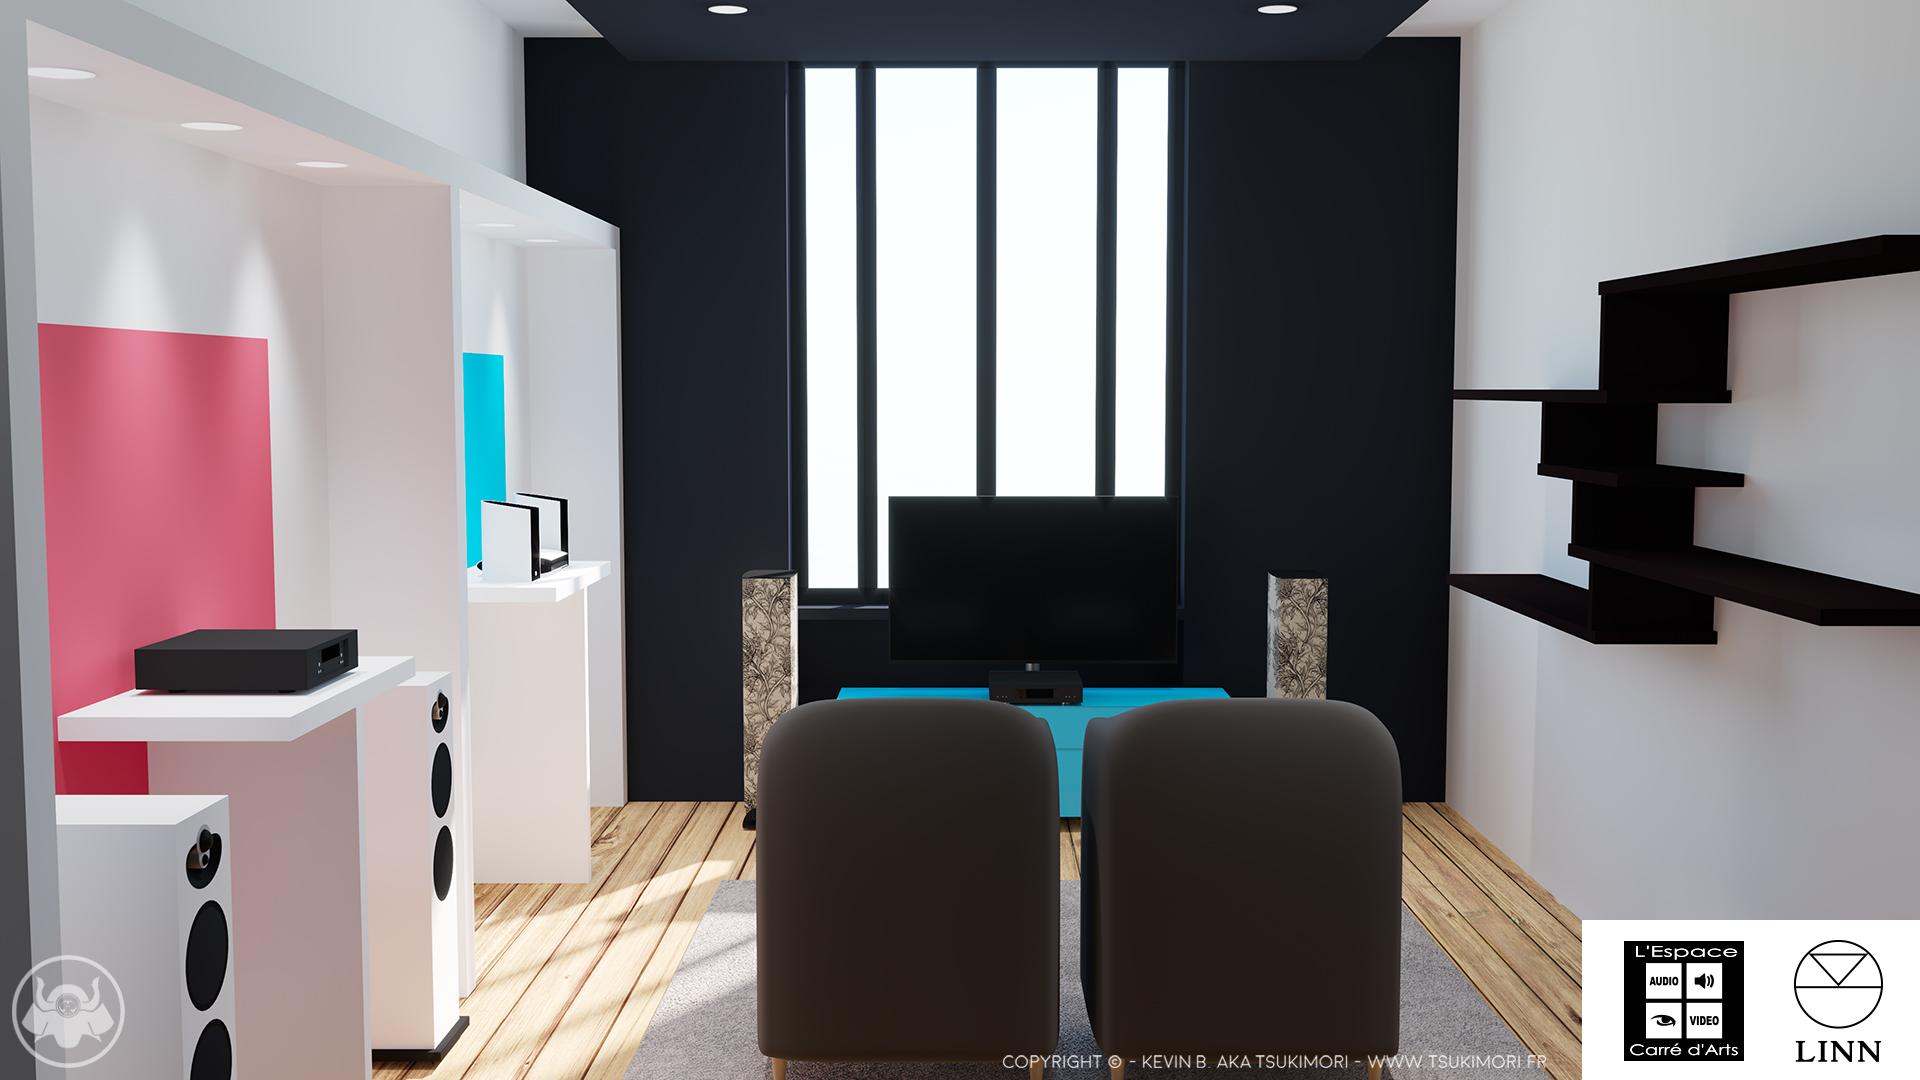 Linn Room / Espace Linn - L'Espace Carré d'Arts